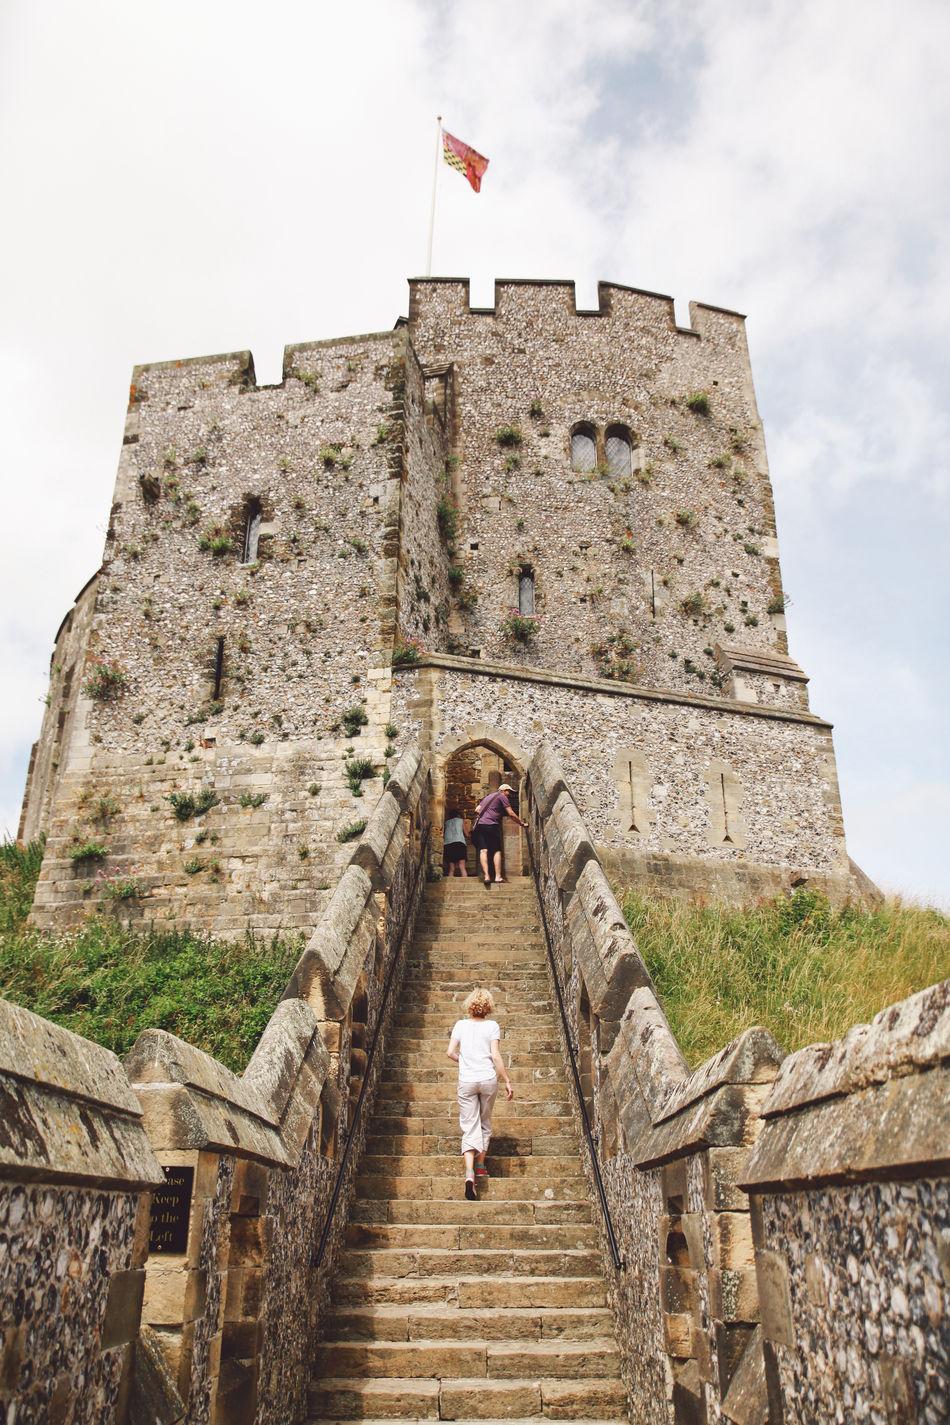 Beautiful stock photos of castle, Architecture, Arundel, Arundel Castle, Built Structure